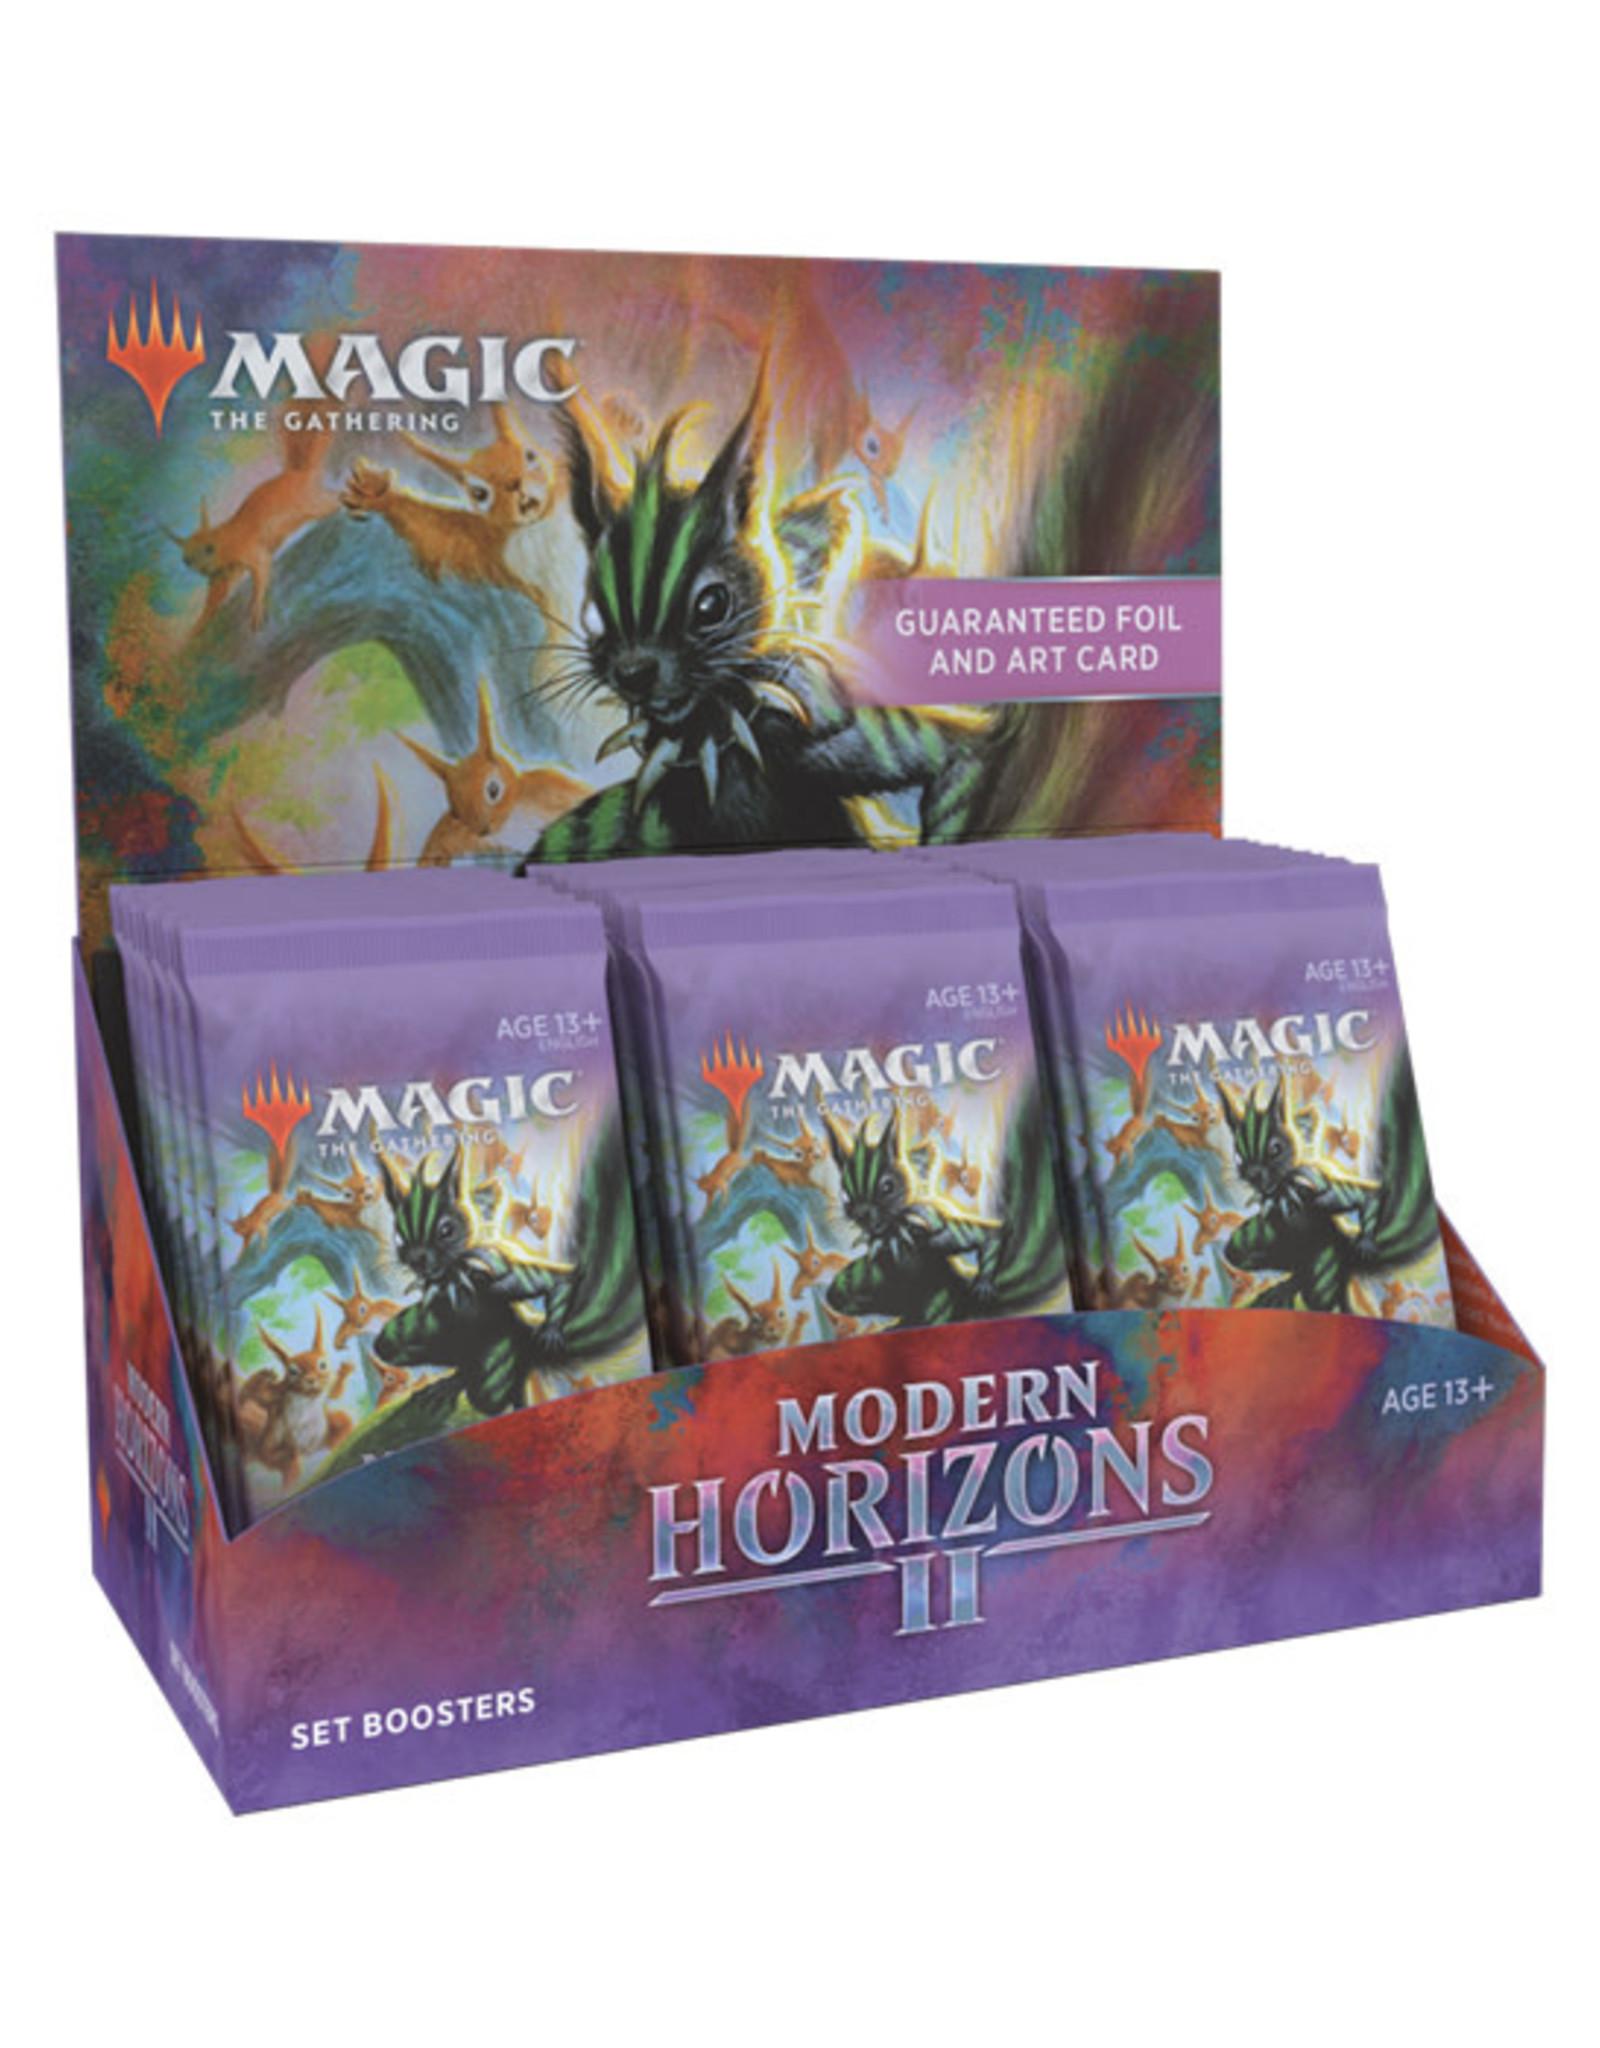 Magic: The Gathering Magic: The Gathering - Modern Horizons 2 - Set Booster Box